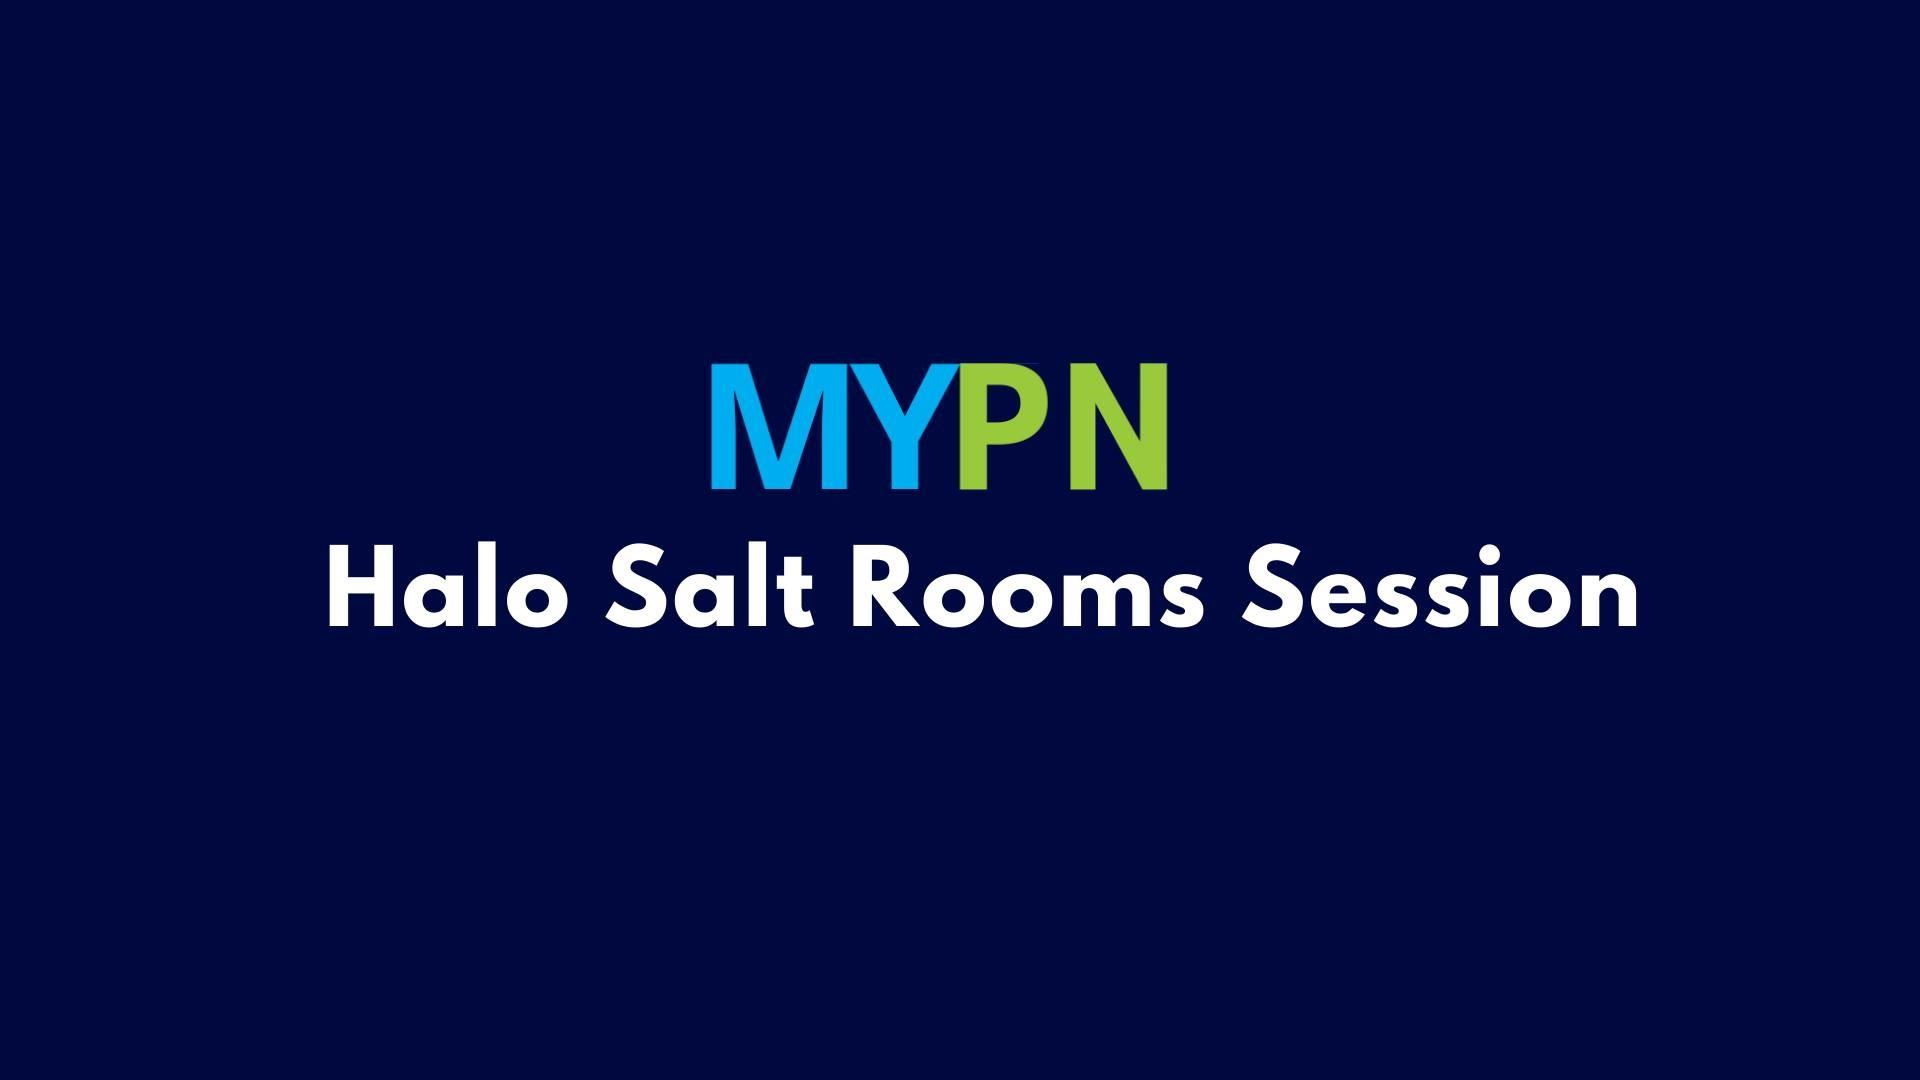 halo salt